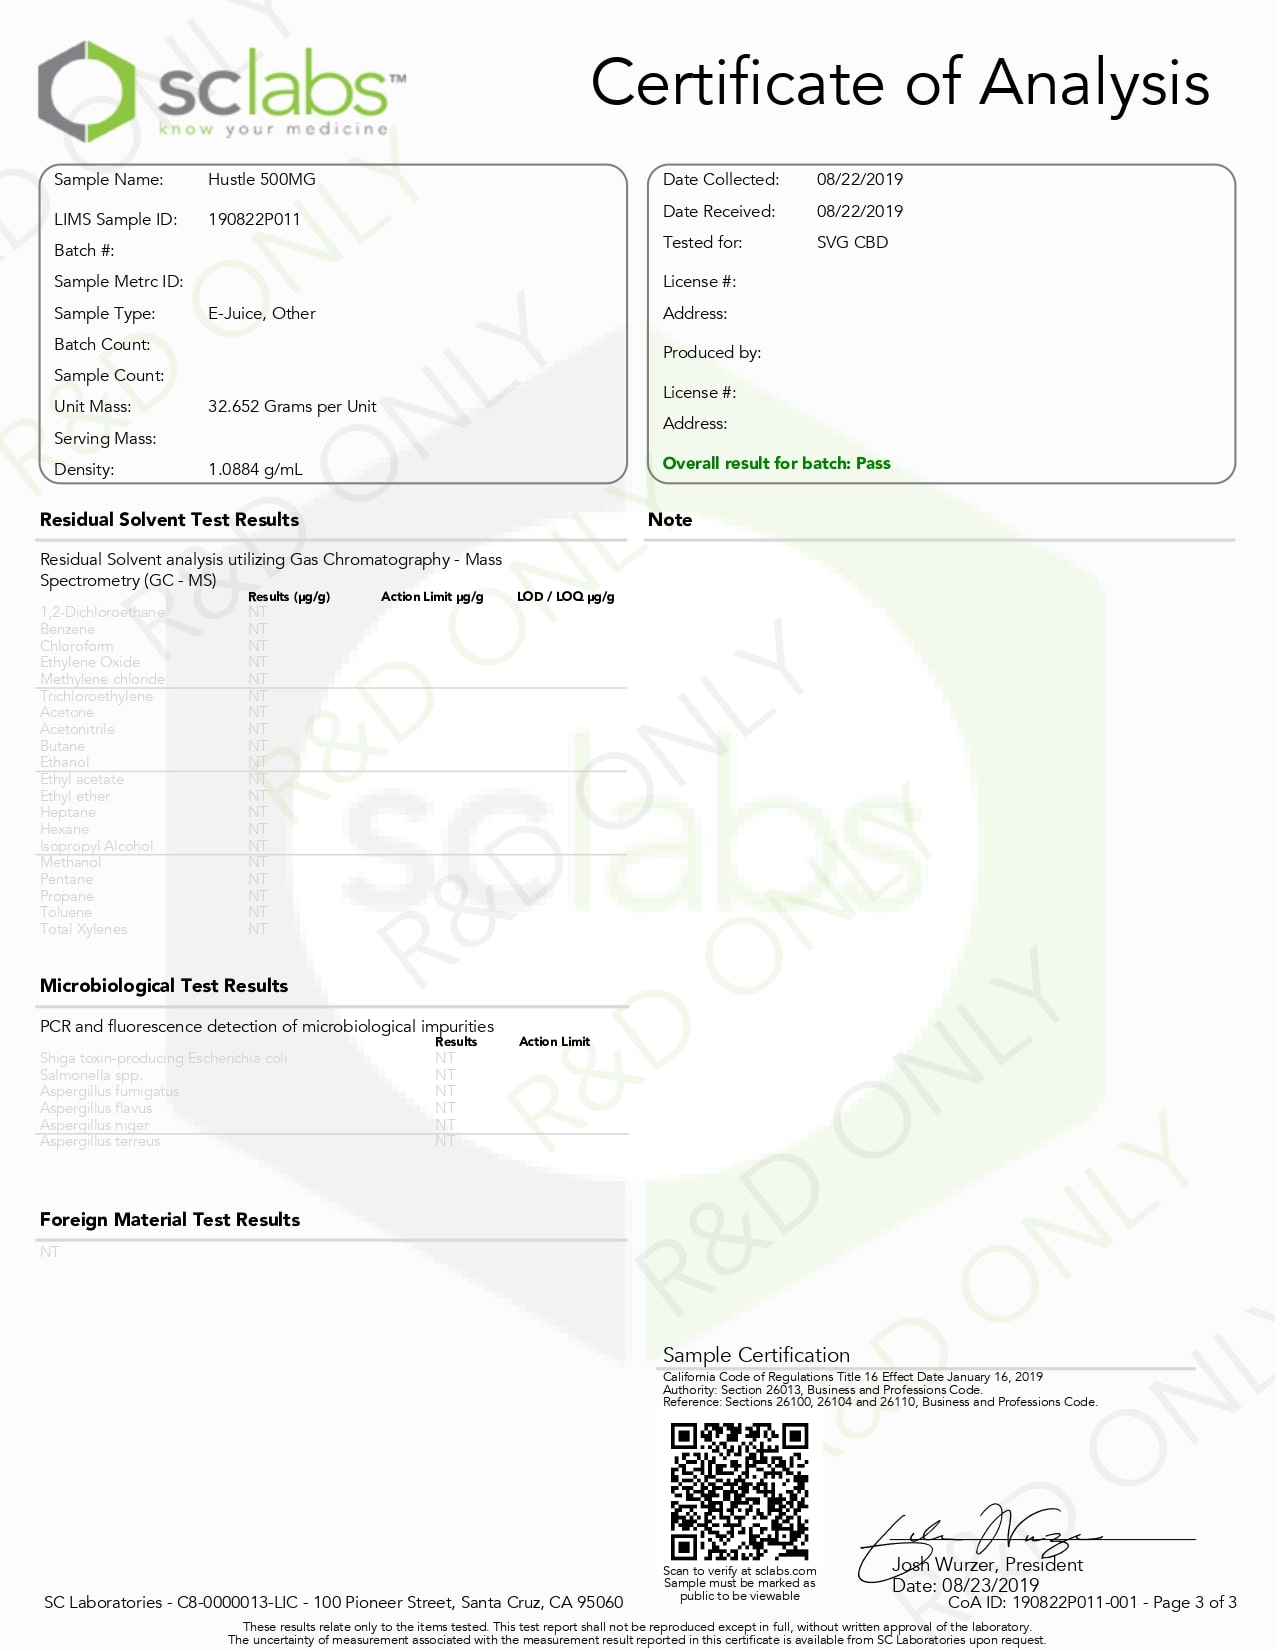 Hustle_500MG_page-0003